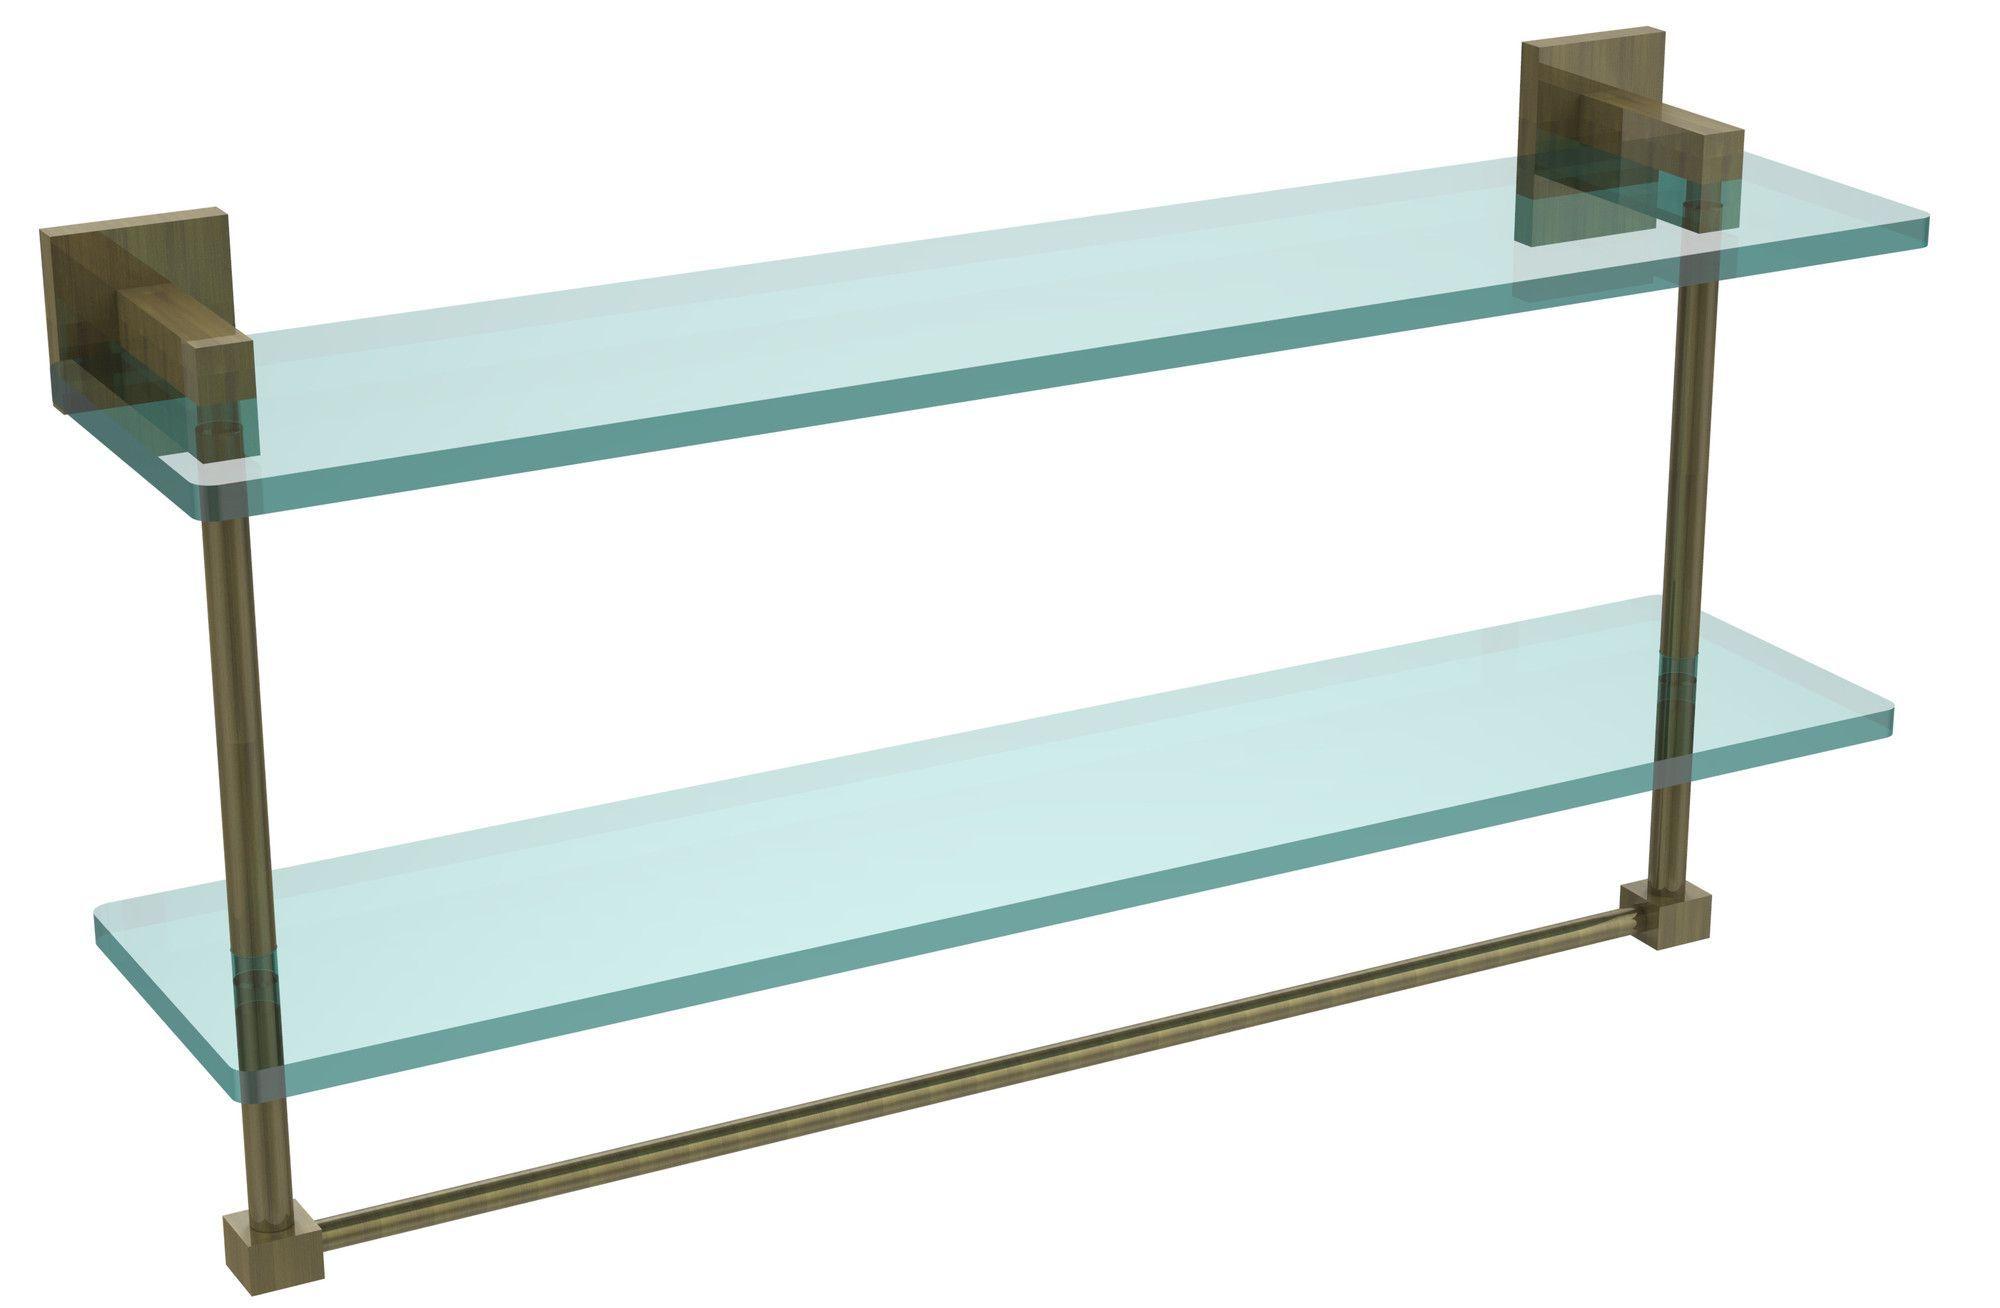 "Montero 22"" x 11.7"" Bathroom Shelf"